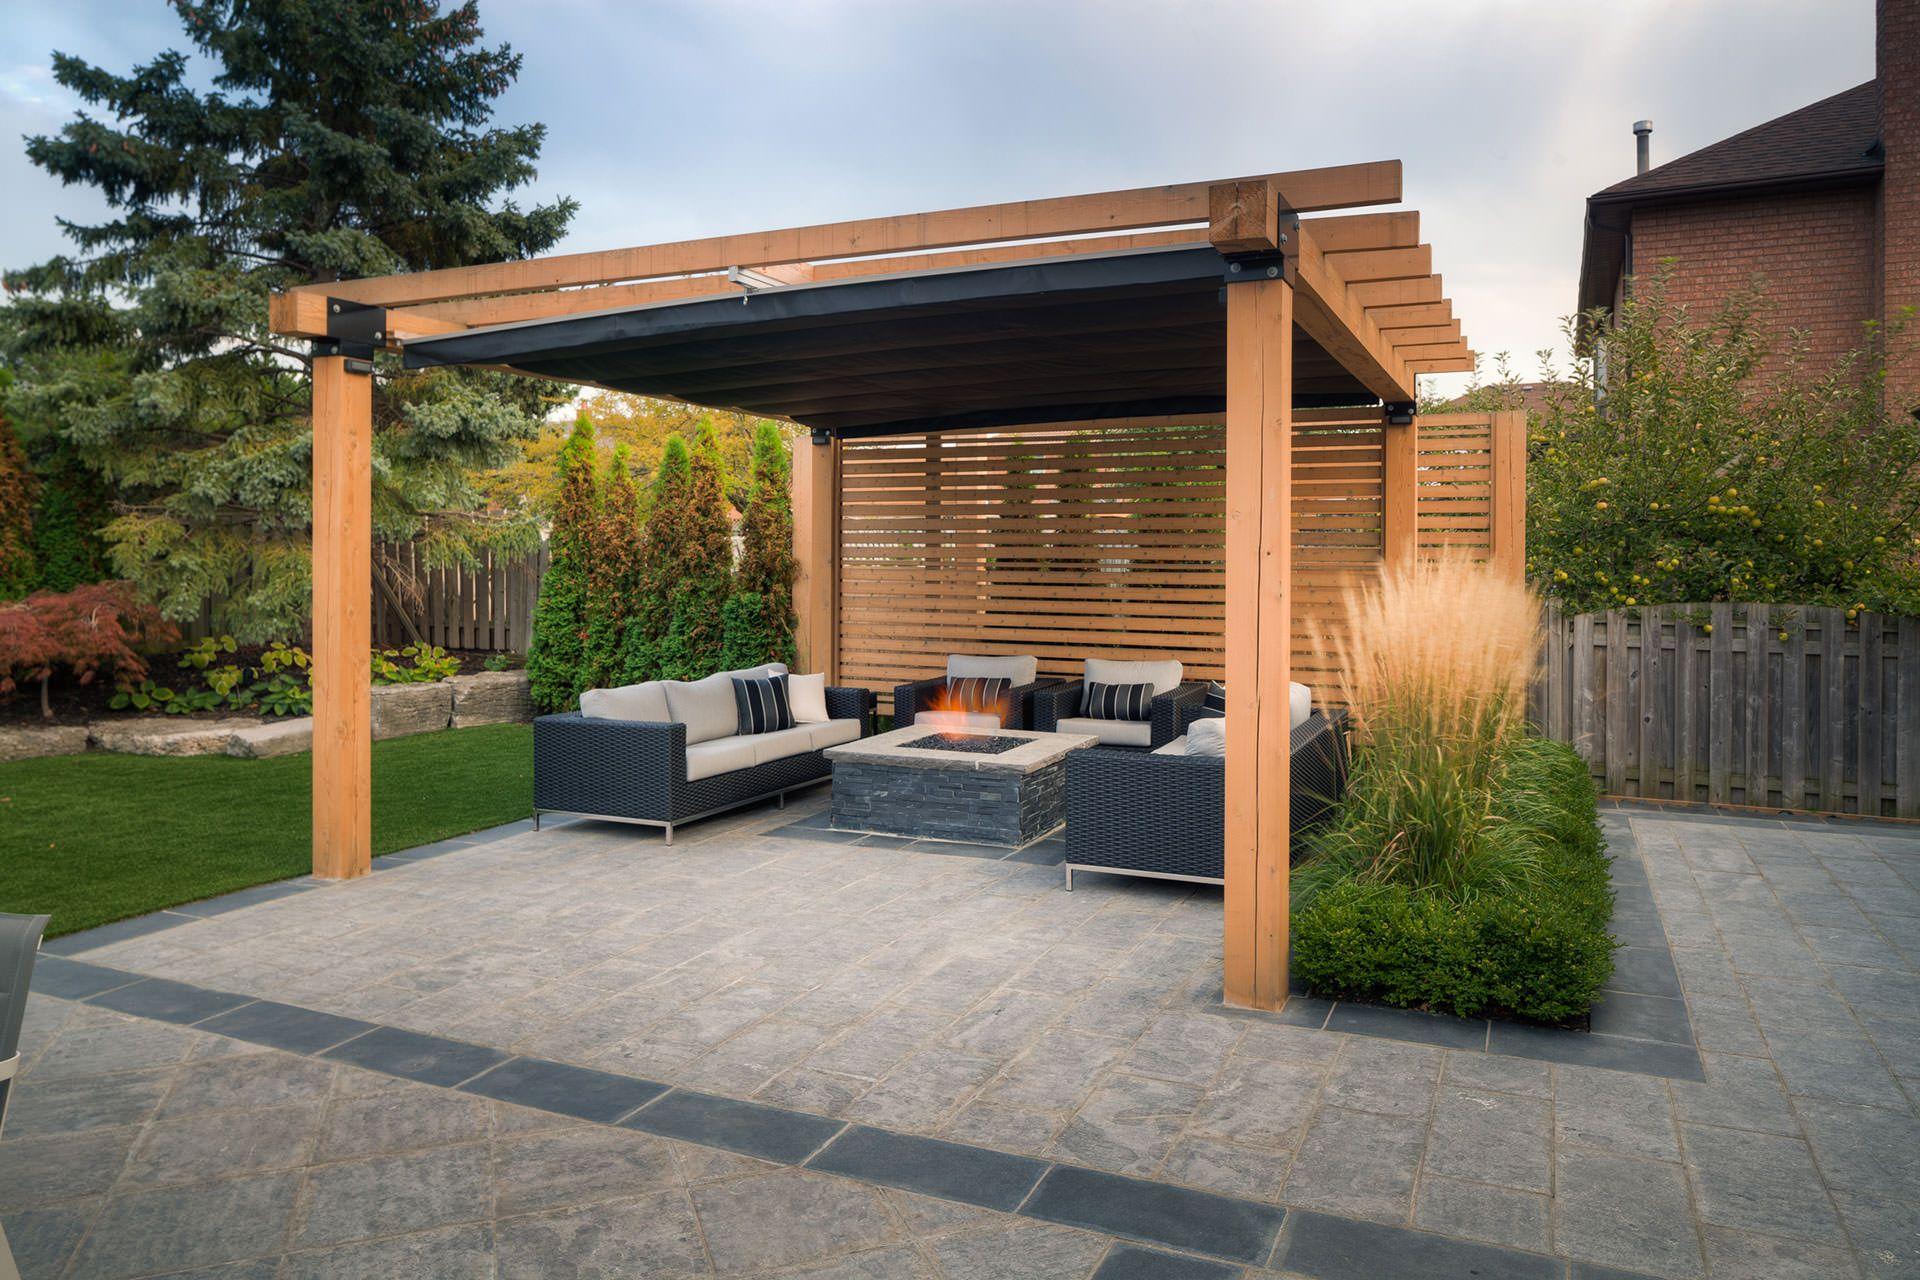 Closet Creation for Under $25 | Backyard shade, Outdoor ...